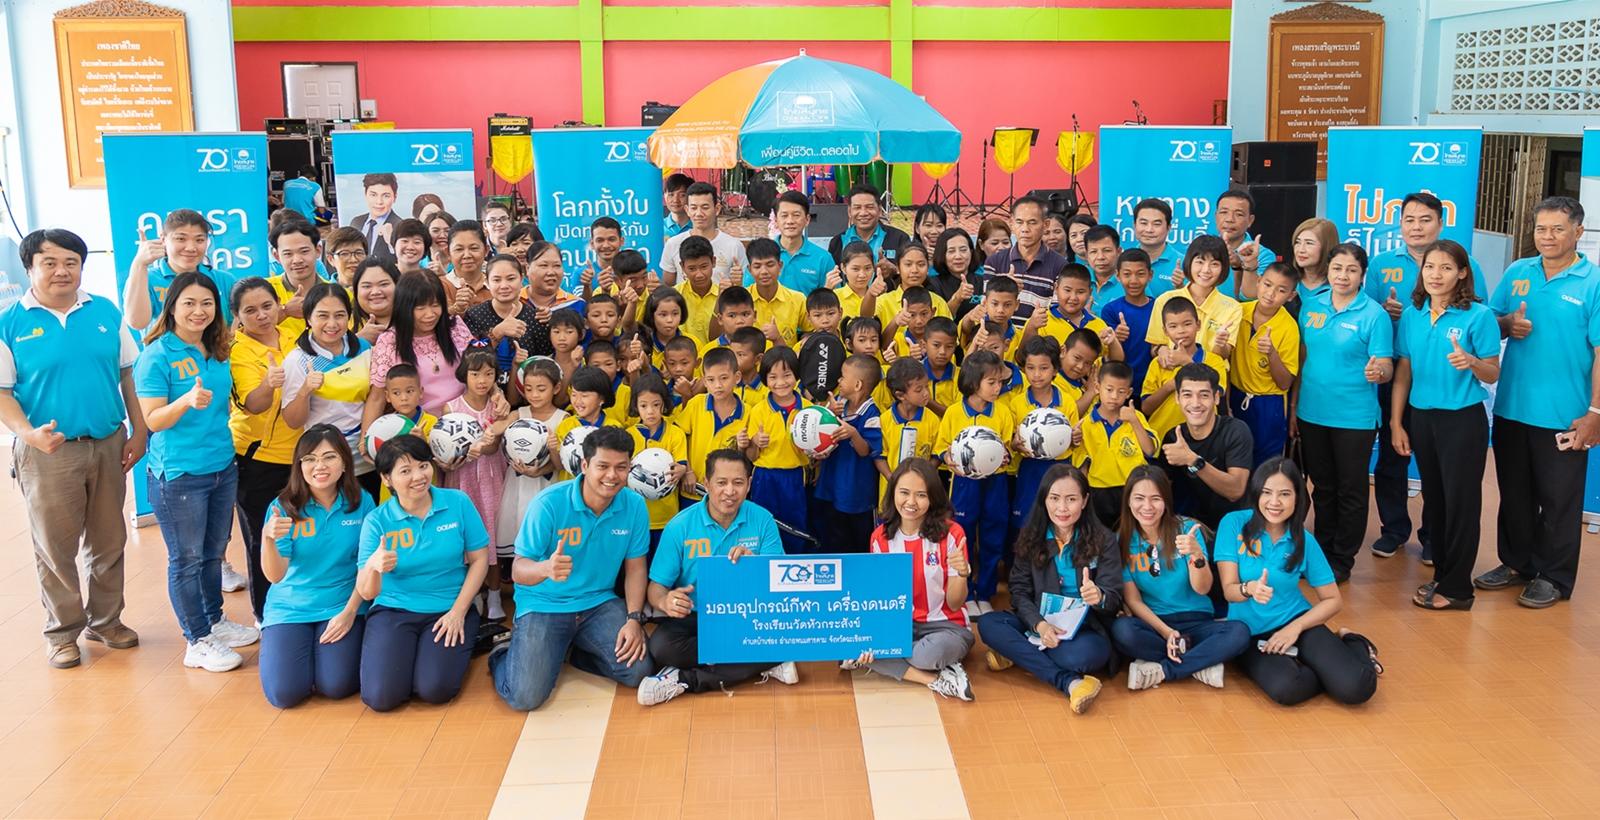 OCEAN LIFE ไทยสมุทร ครบรอบ 70 ปี แบ่งฝันปันรักให้น้องๆ 7 โรงเรียนทั่วไทย